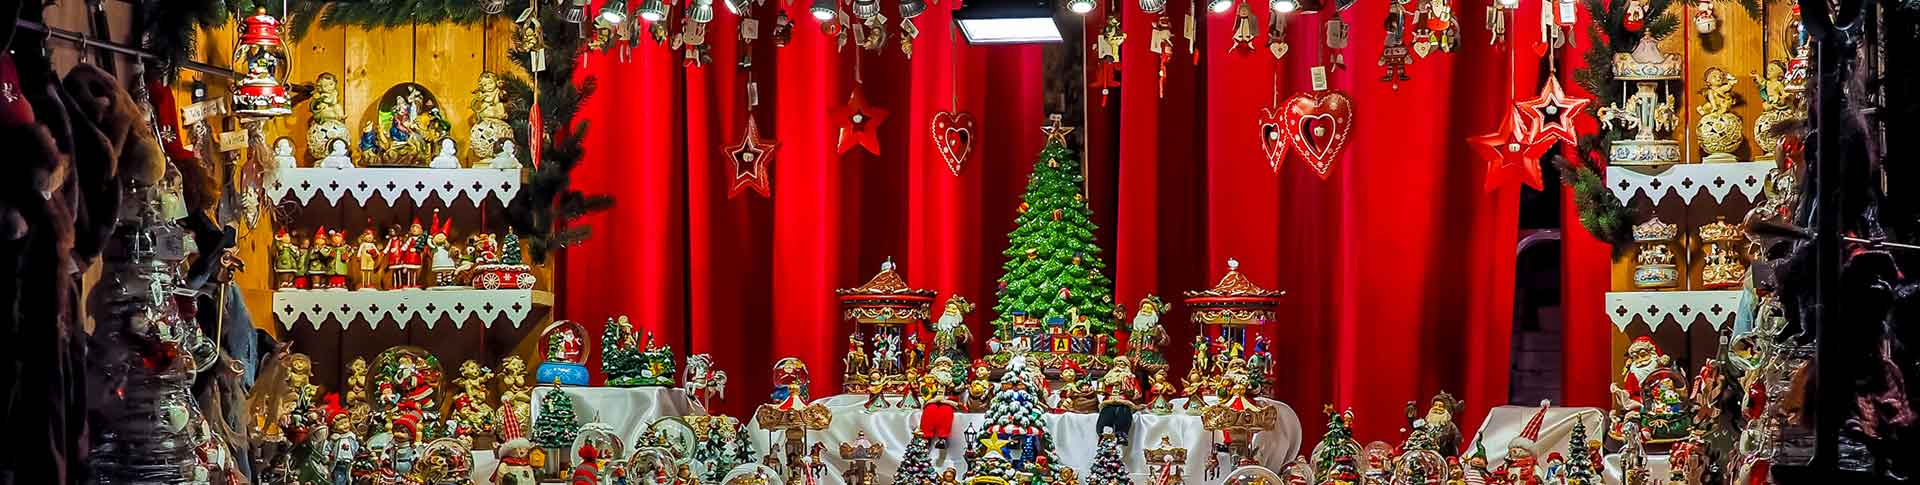 Dating Dias Χριστουγεννιάτικη κάρτα ιδέες λίστα online ιστοσελίδες γνωριμιών δωρεάν